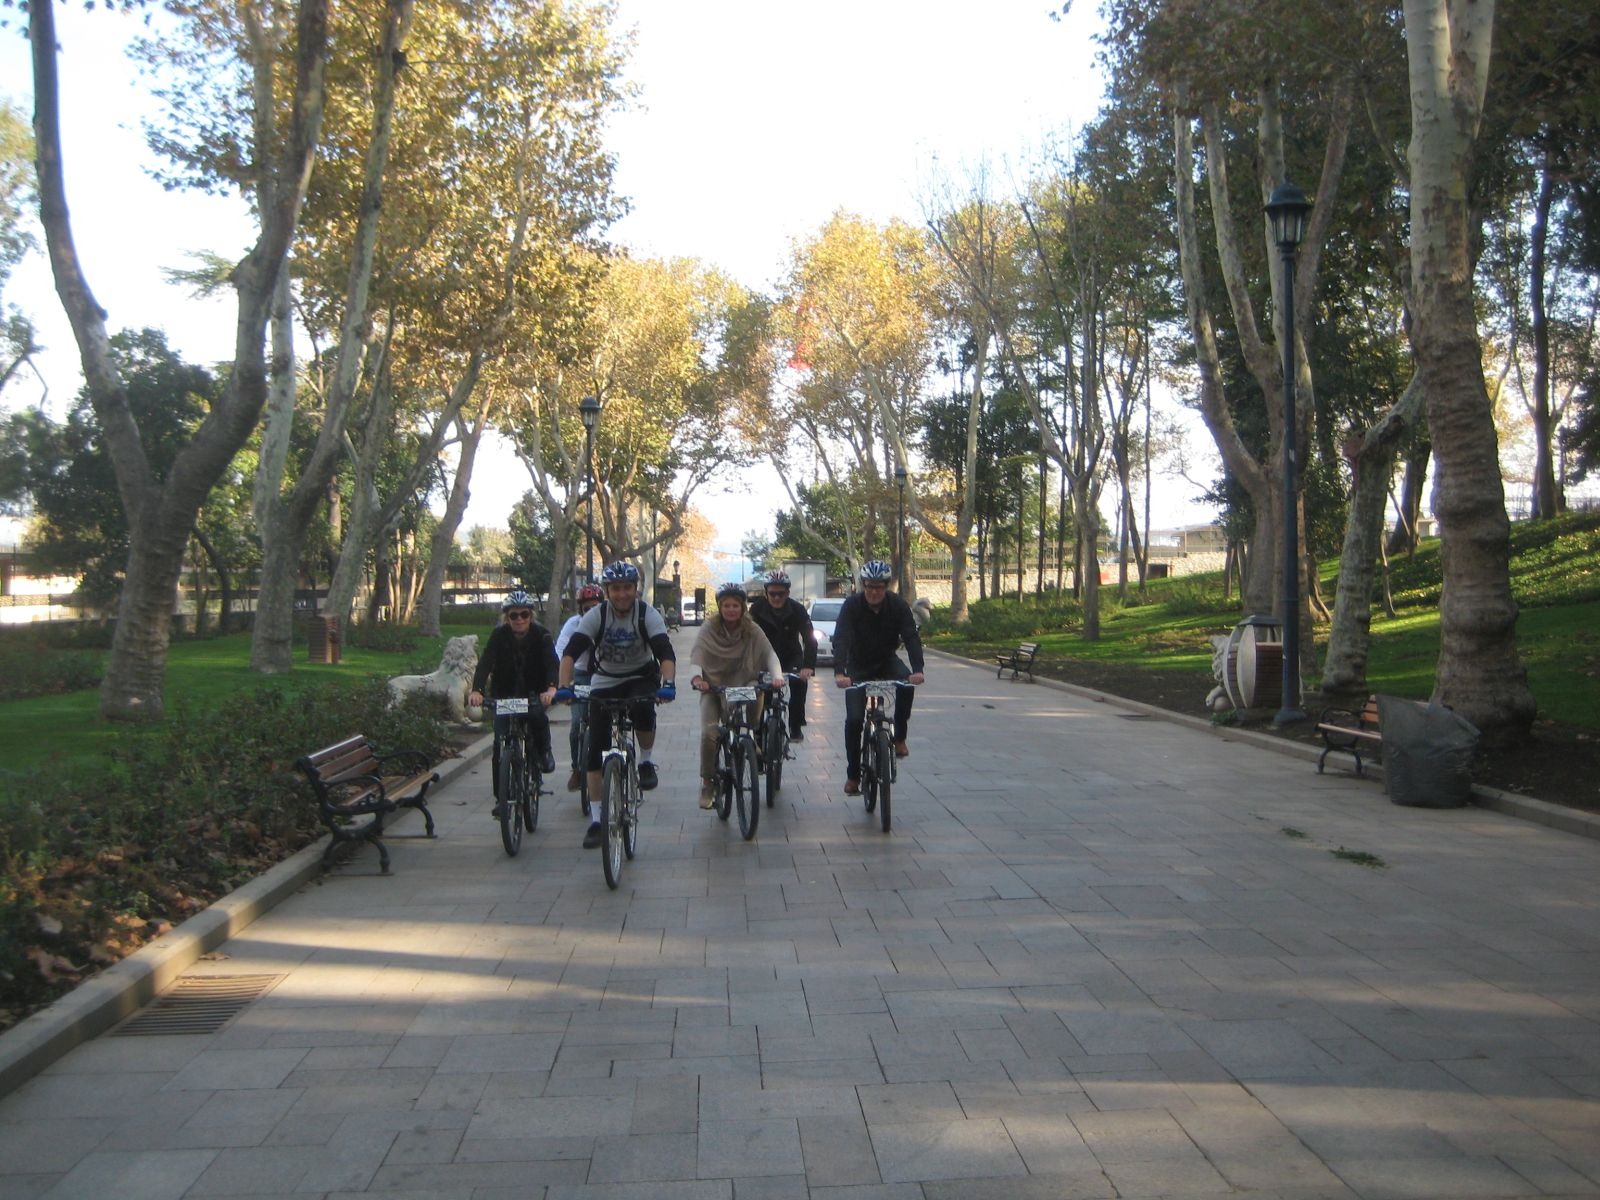 Gulhane Park Old City Bike Tour Group Riding